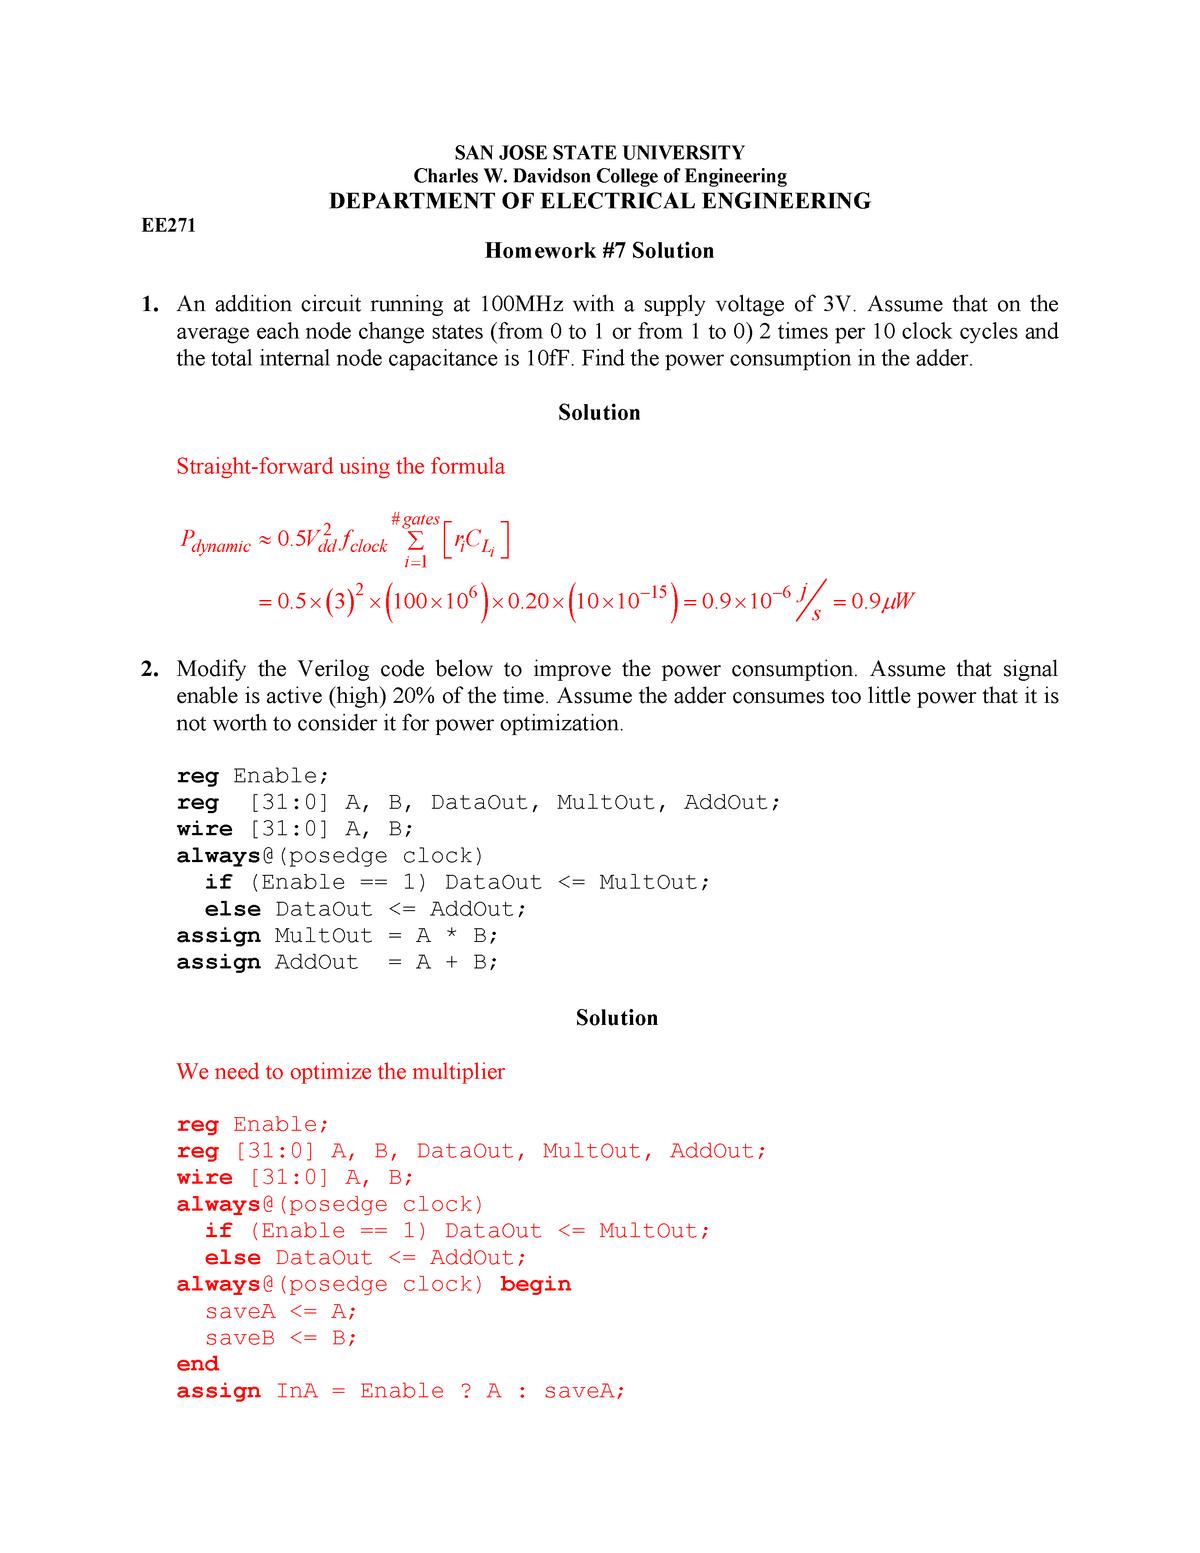 271hw7 sol - Mandatory assignment solution - EE 271: Digital